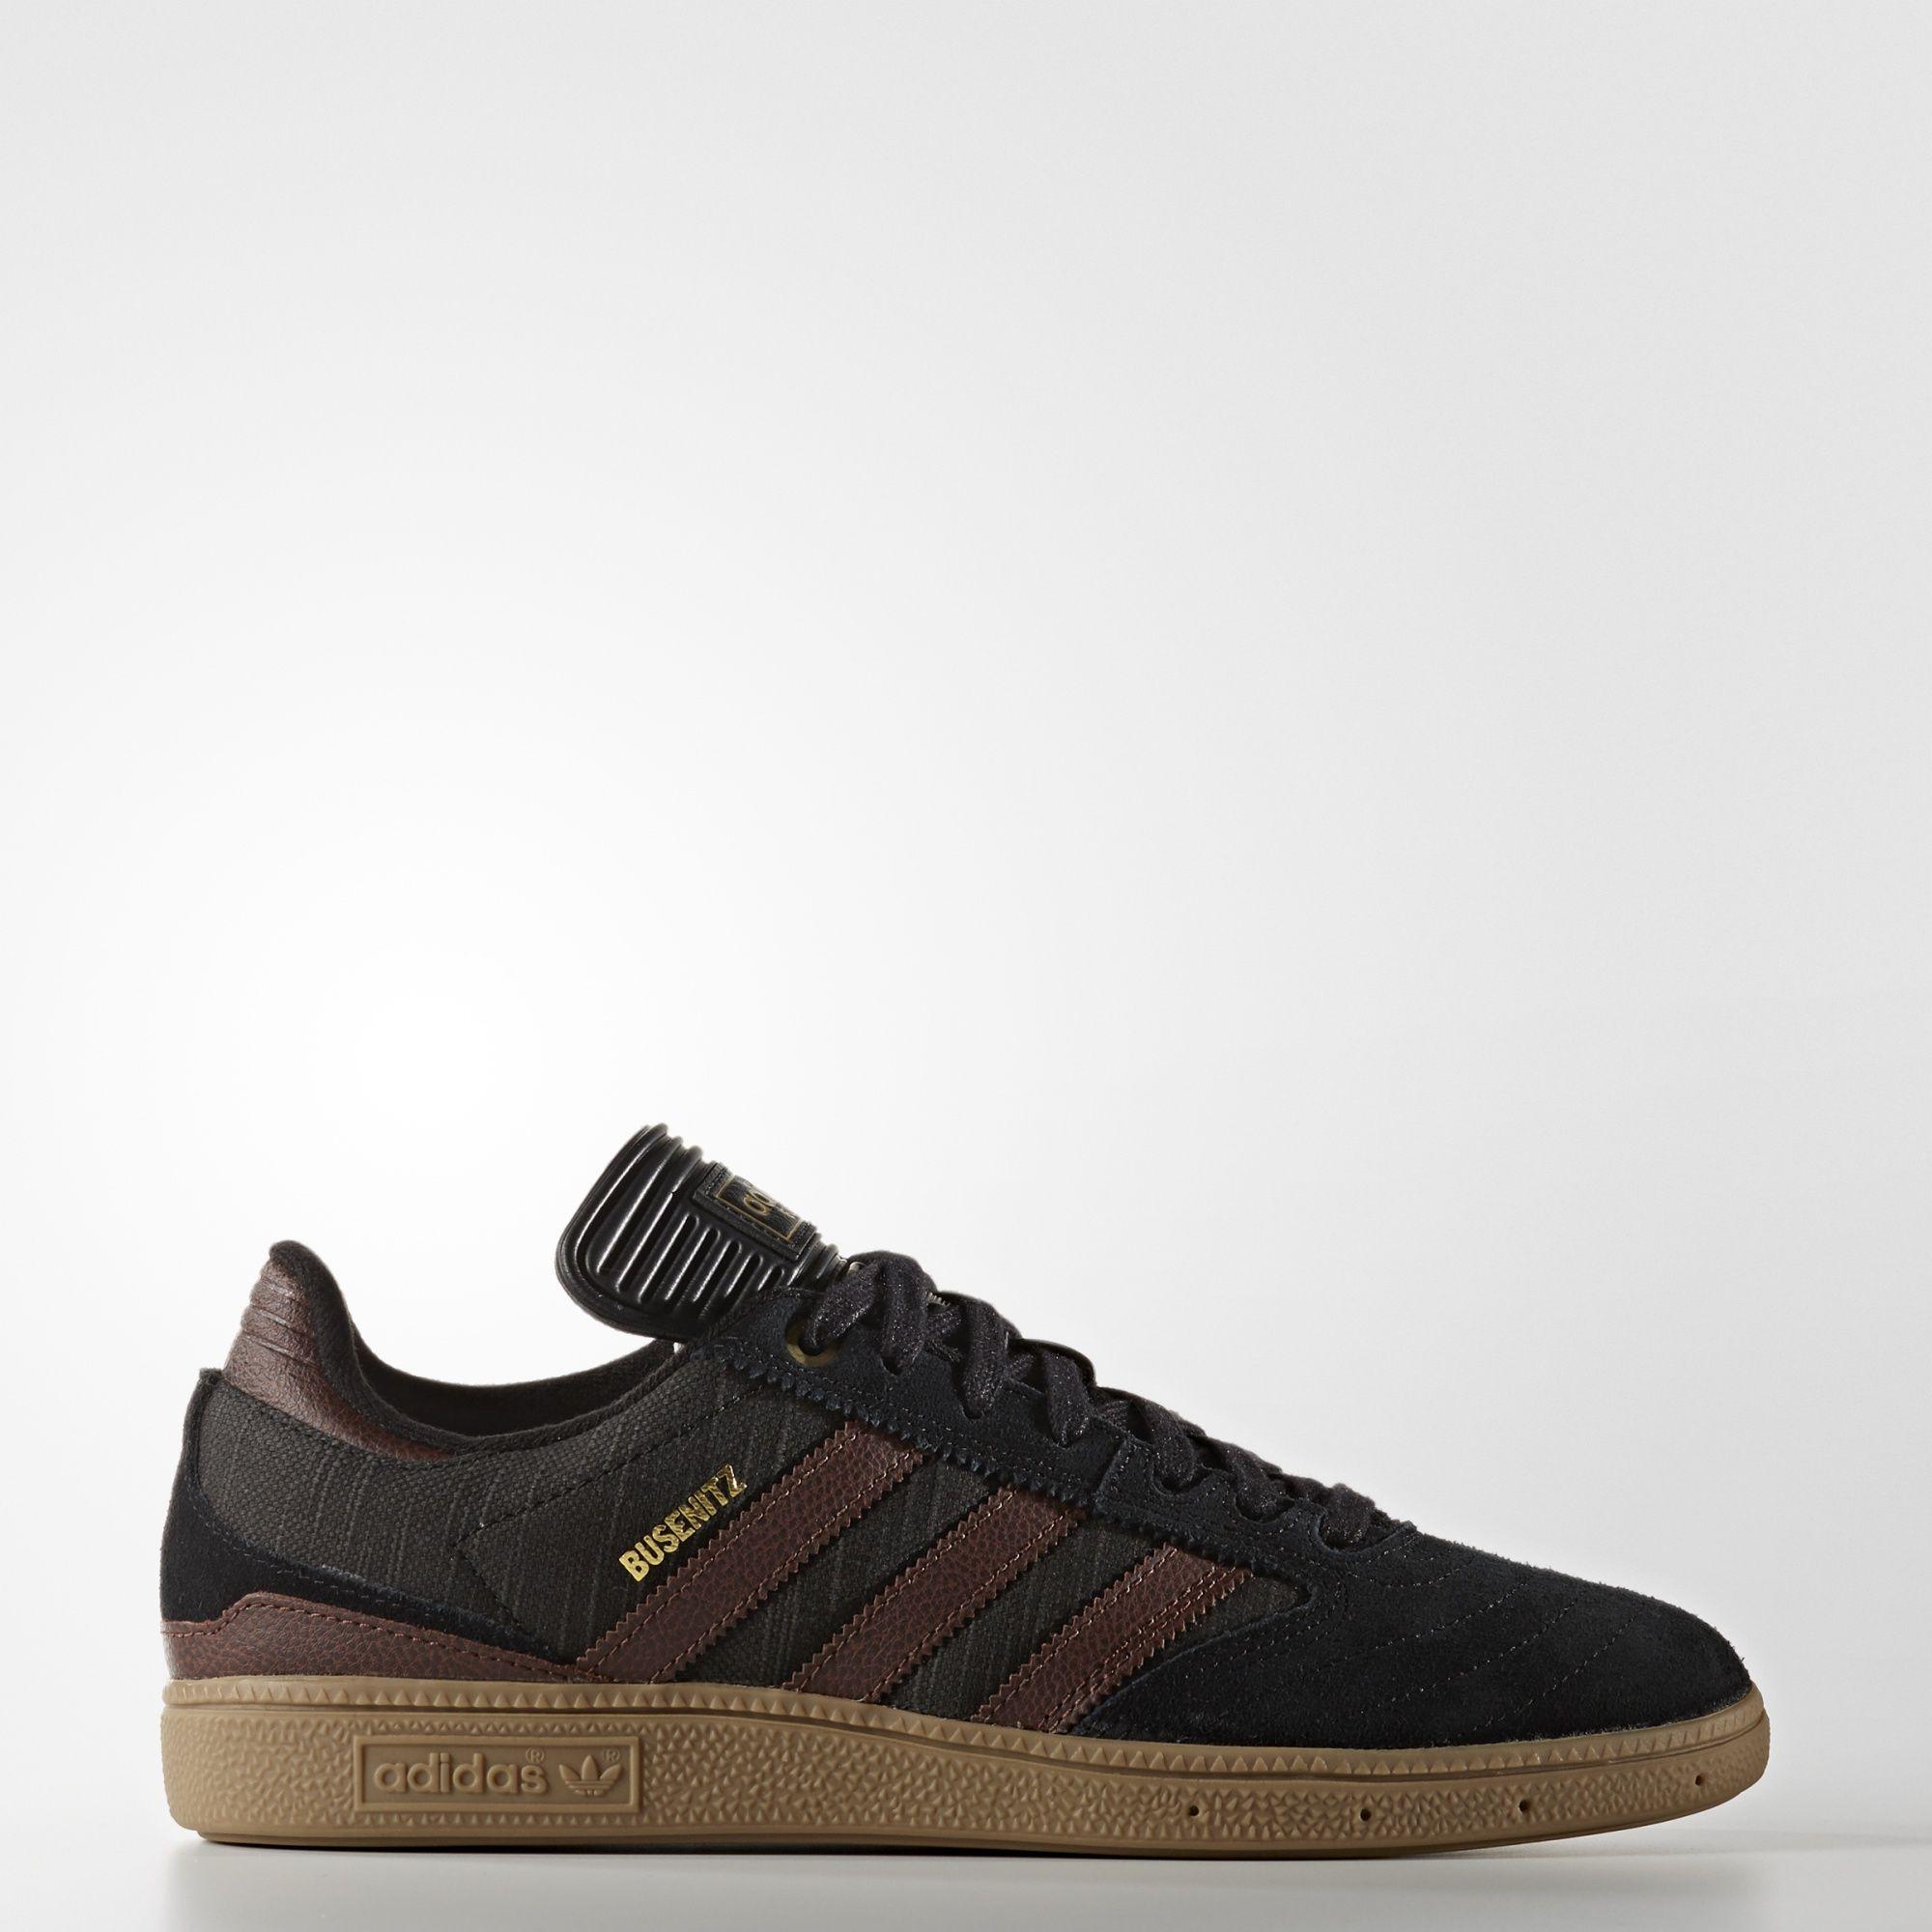 adidas Busenitz Classified Mens Shoes Brown Black